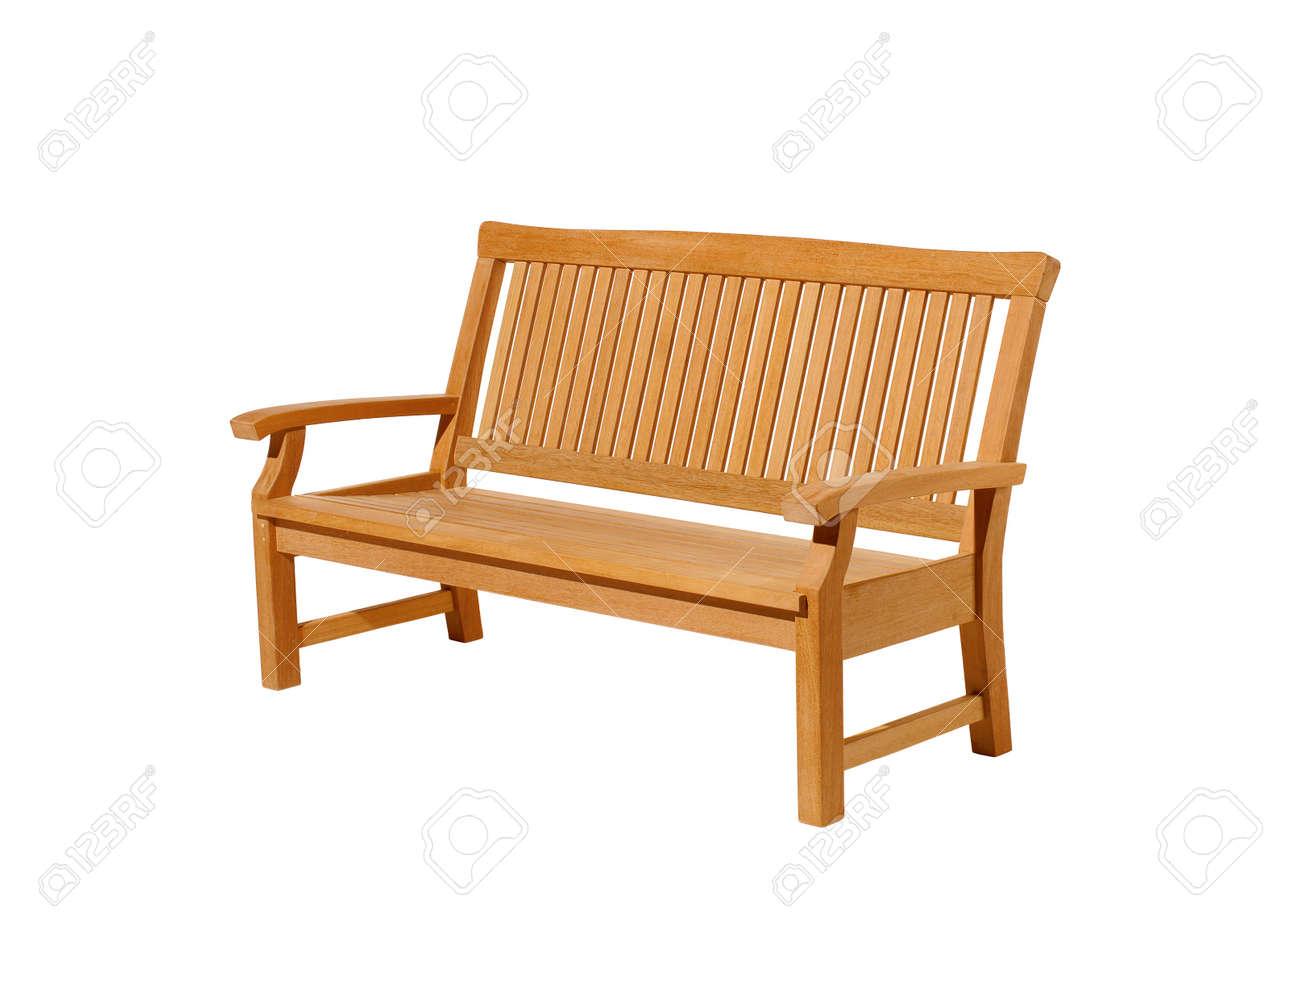 Bench Isolated On White Background Stock Photo - 9586421